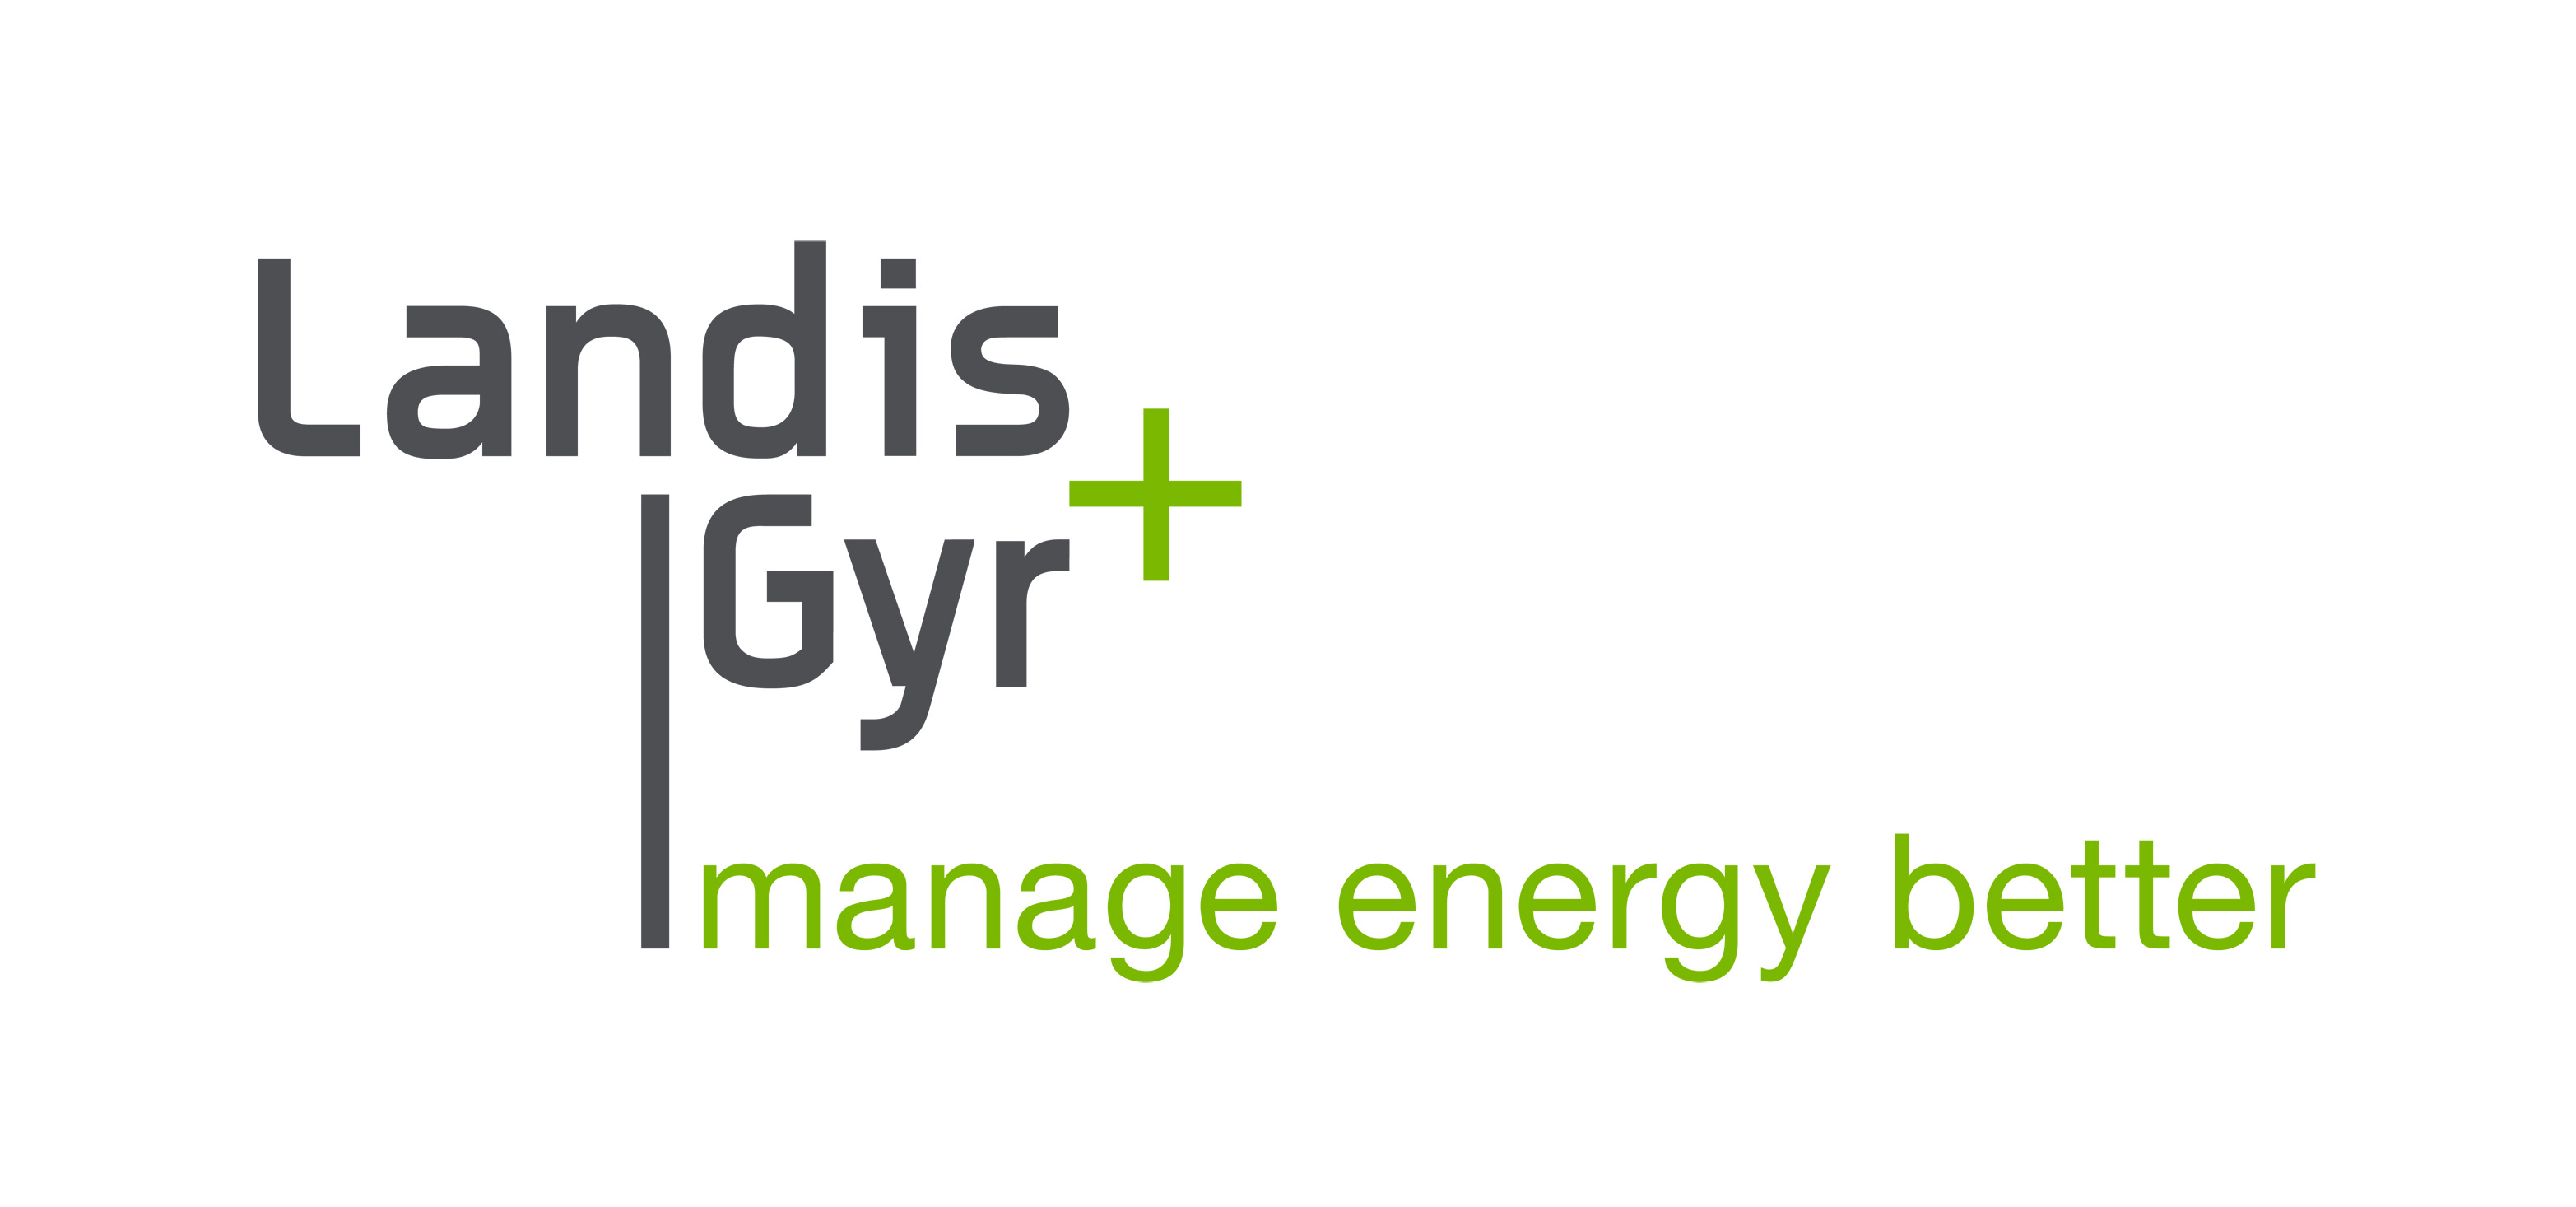 landis-gyr-system-specialist-finland-sdsuu-3222942 logo